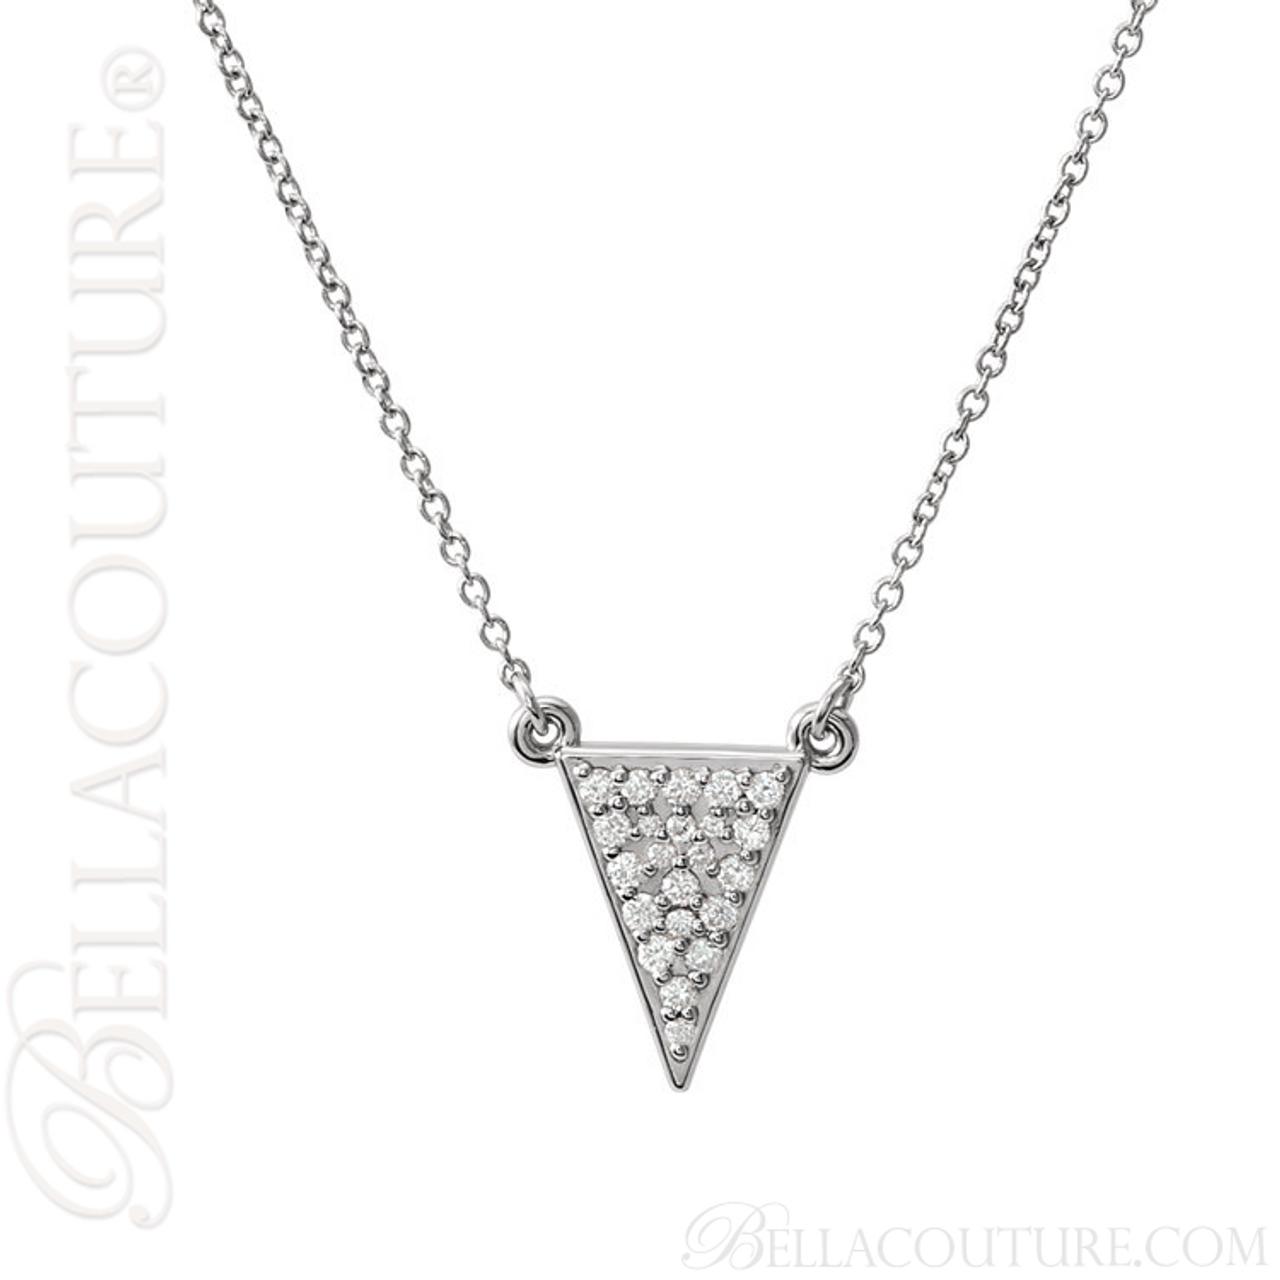 New bella couture dalani pave diamond 14k white gold triangle new bella couture dalani pave diamond 14k white gold triangle arrow pendant necklace aloadofball Images